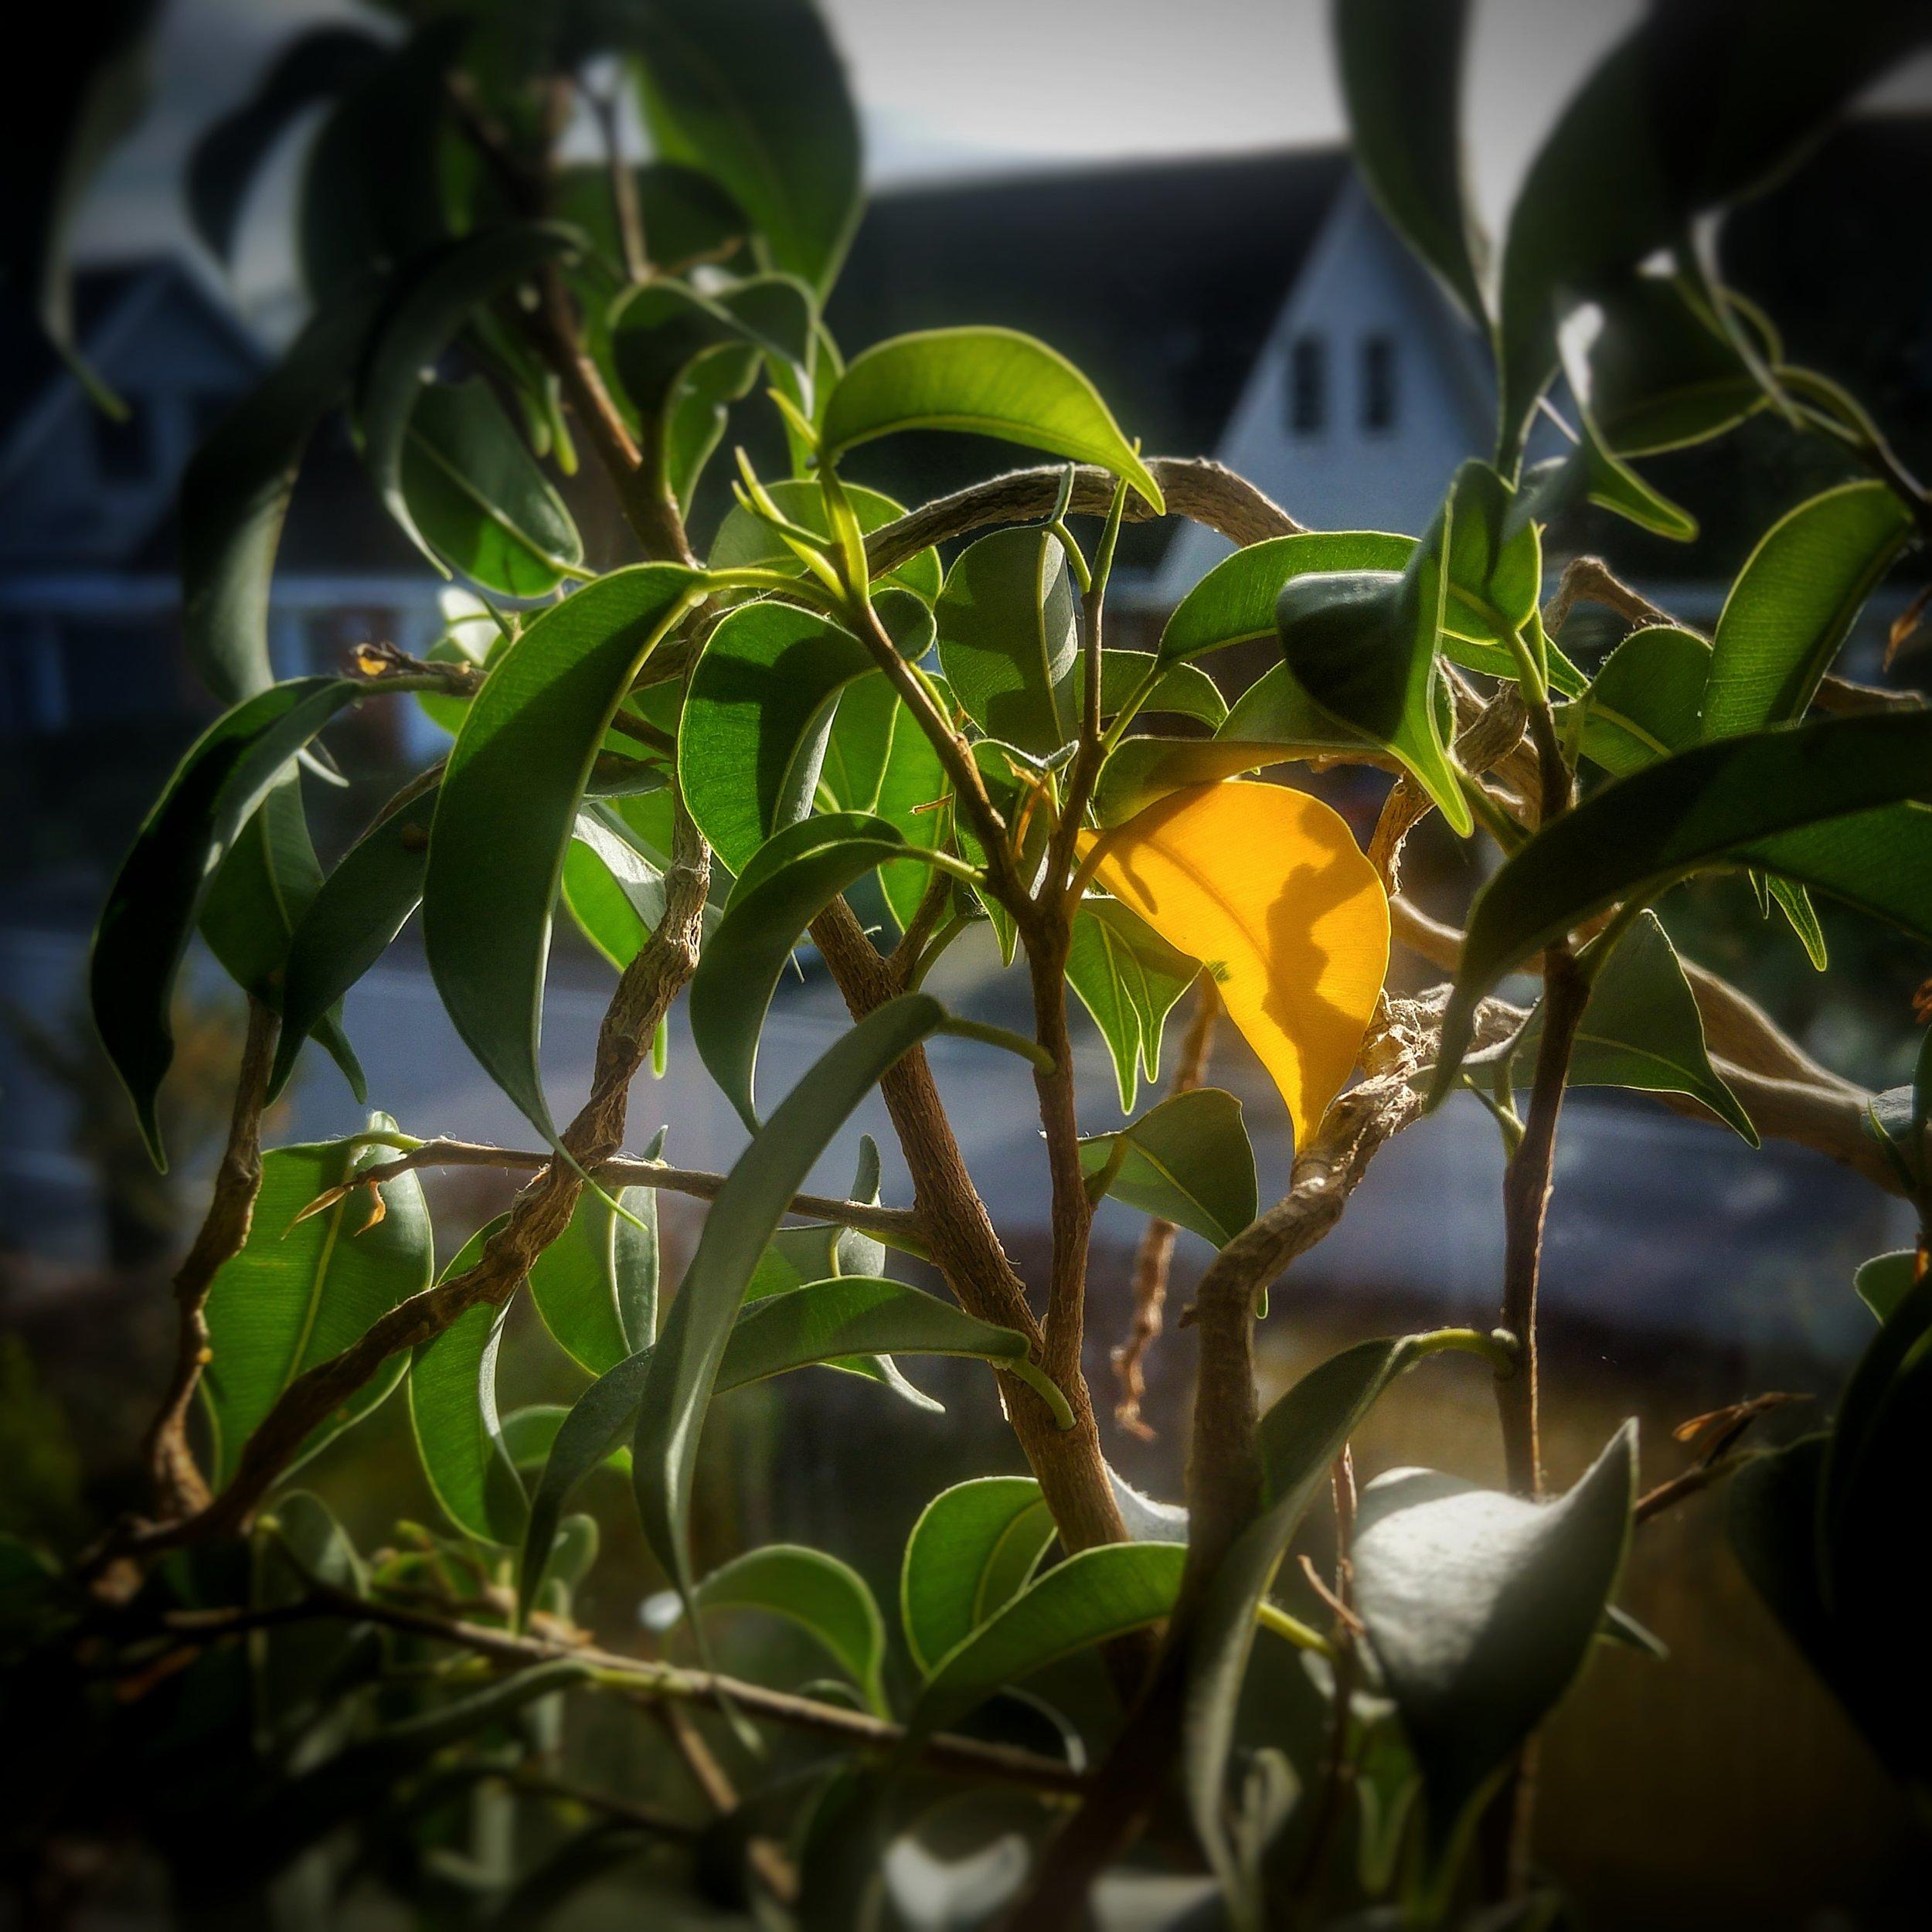 November 17 - Day 322: Yellow Leaf